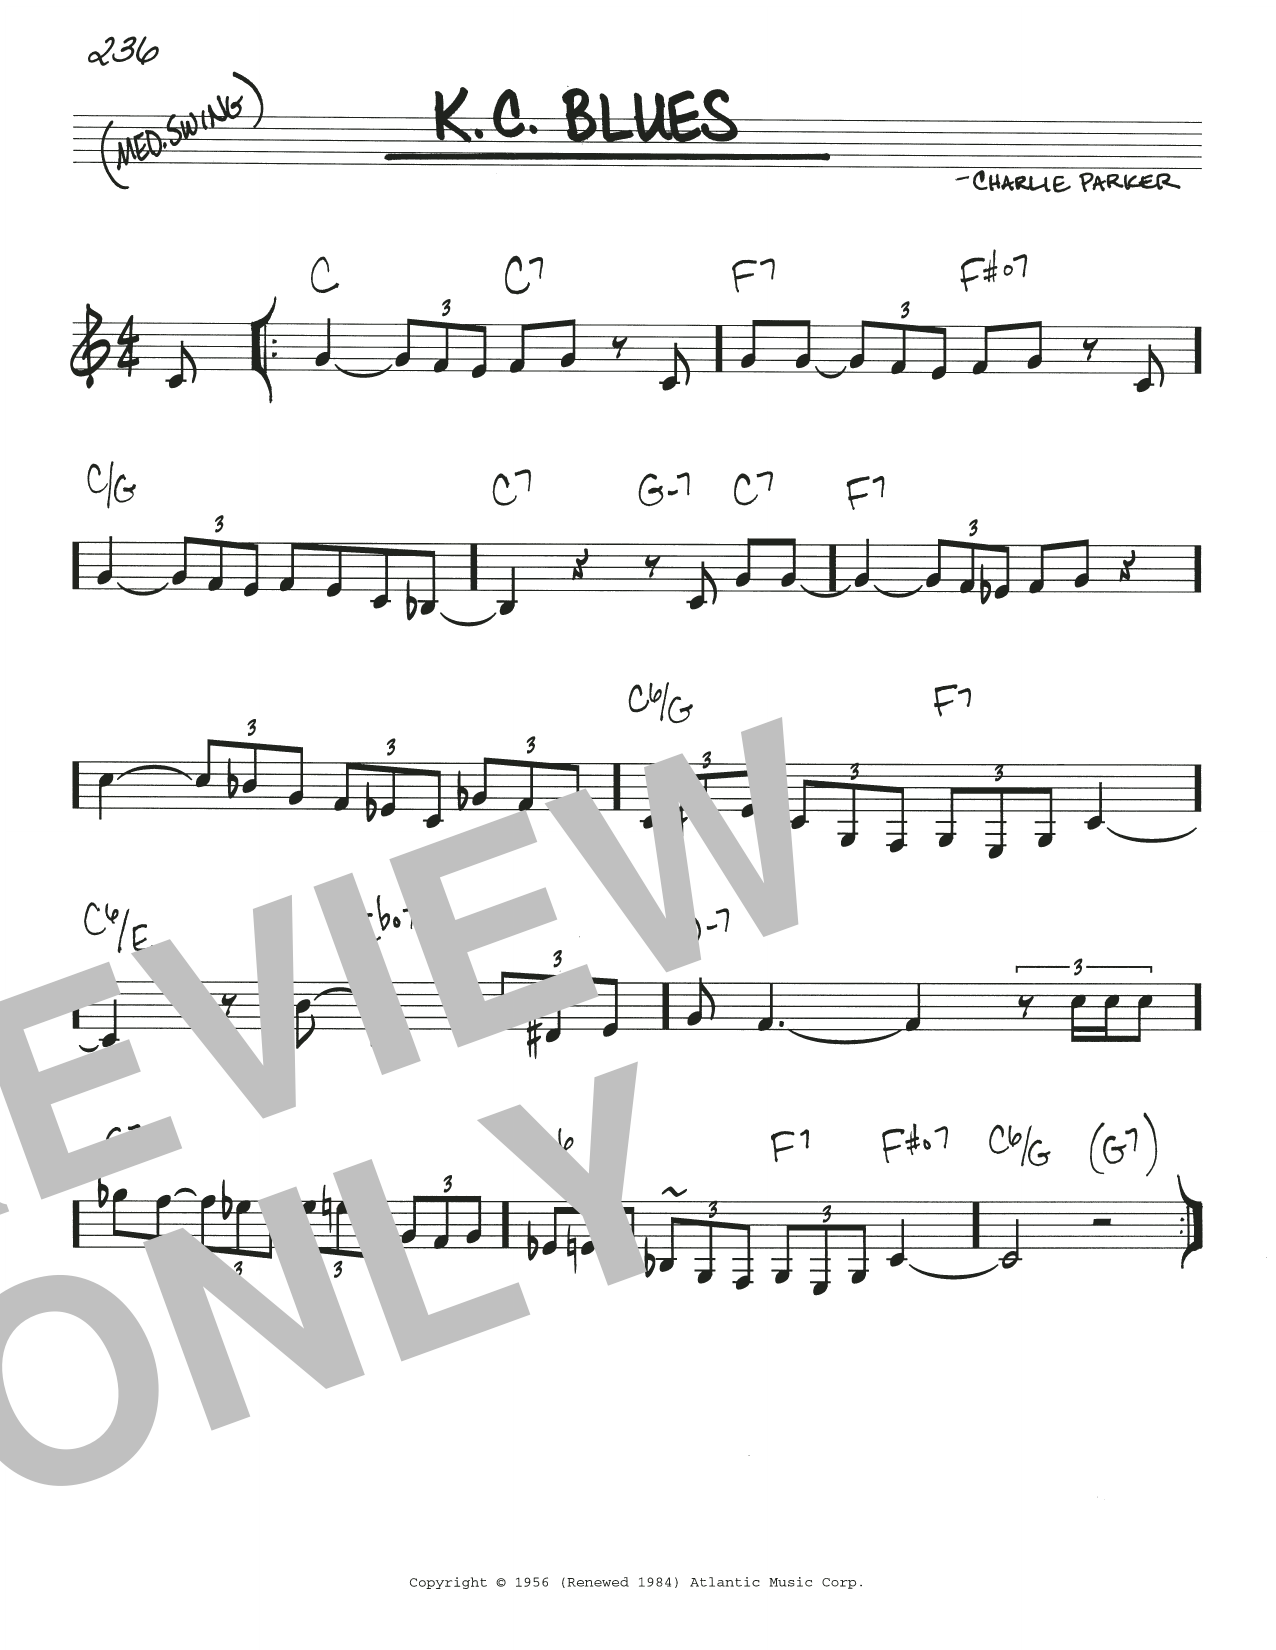 k.c. blues sheet music   charlie parker   real book – melody & chords  sheet music direct